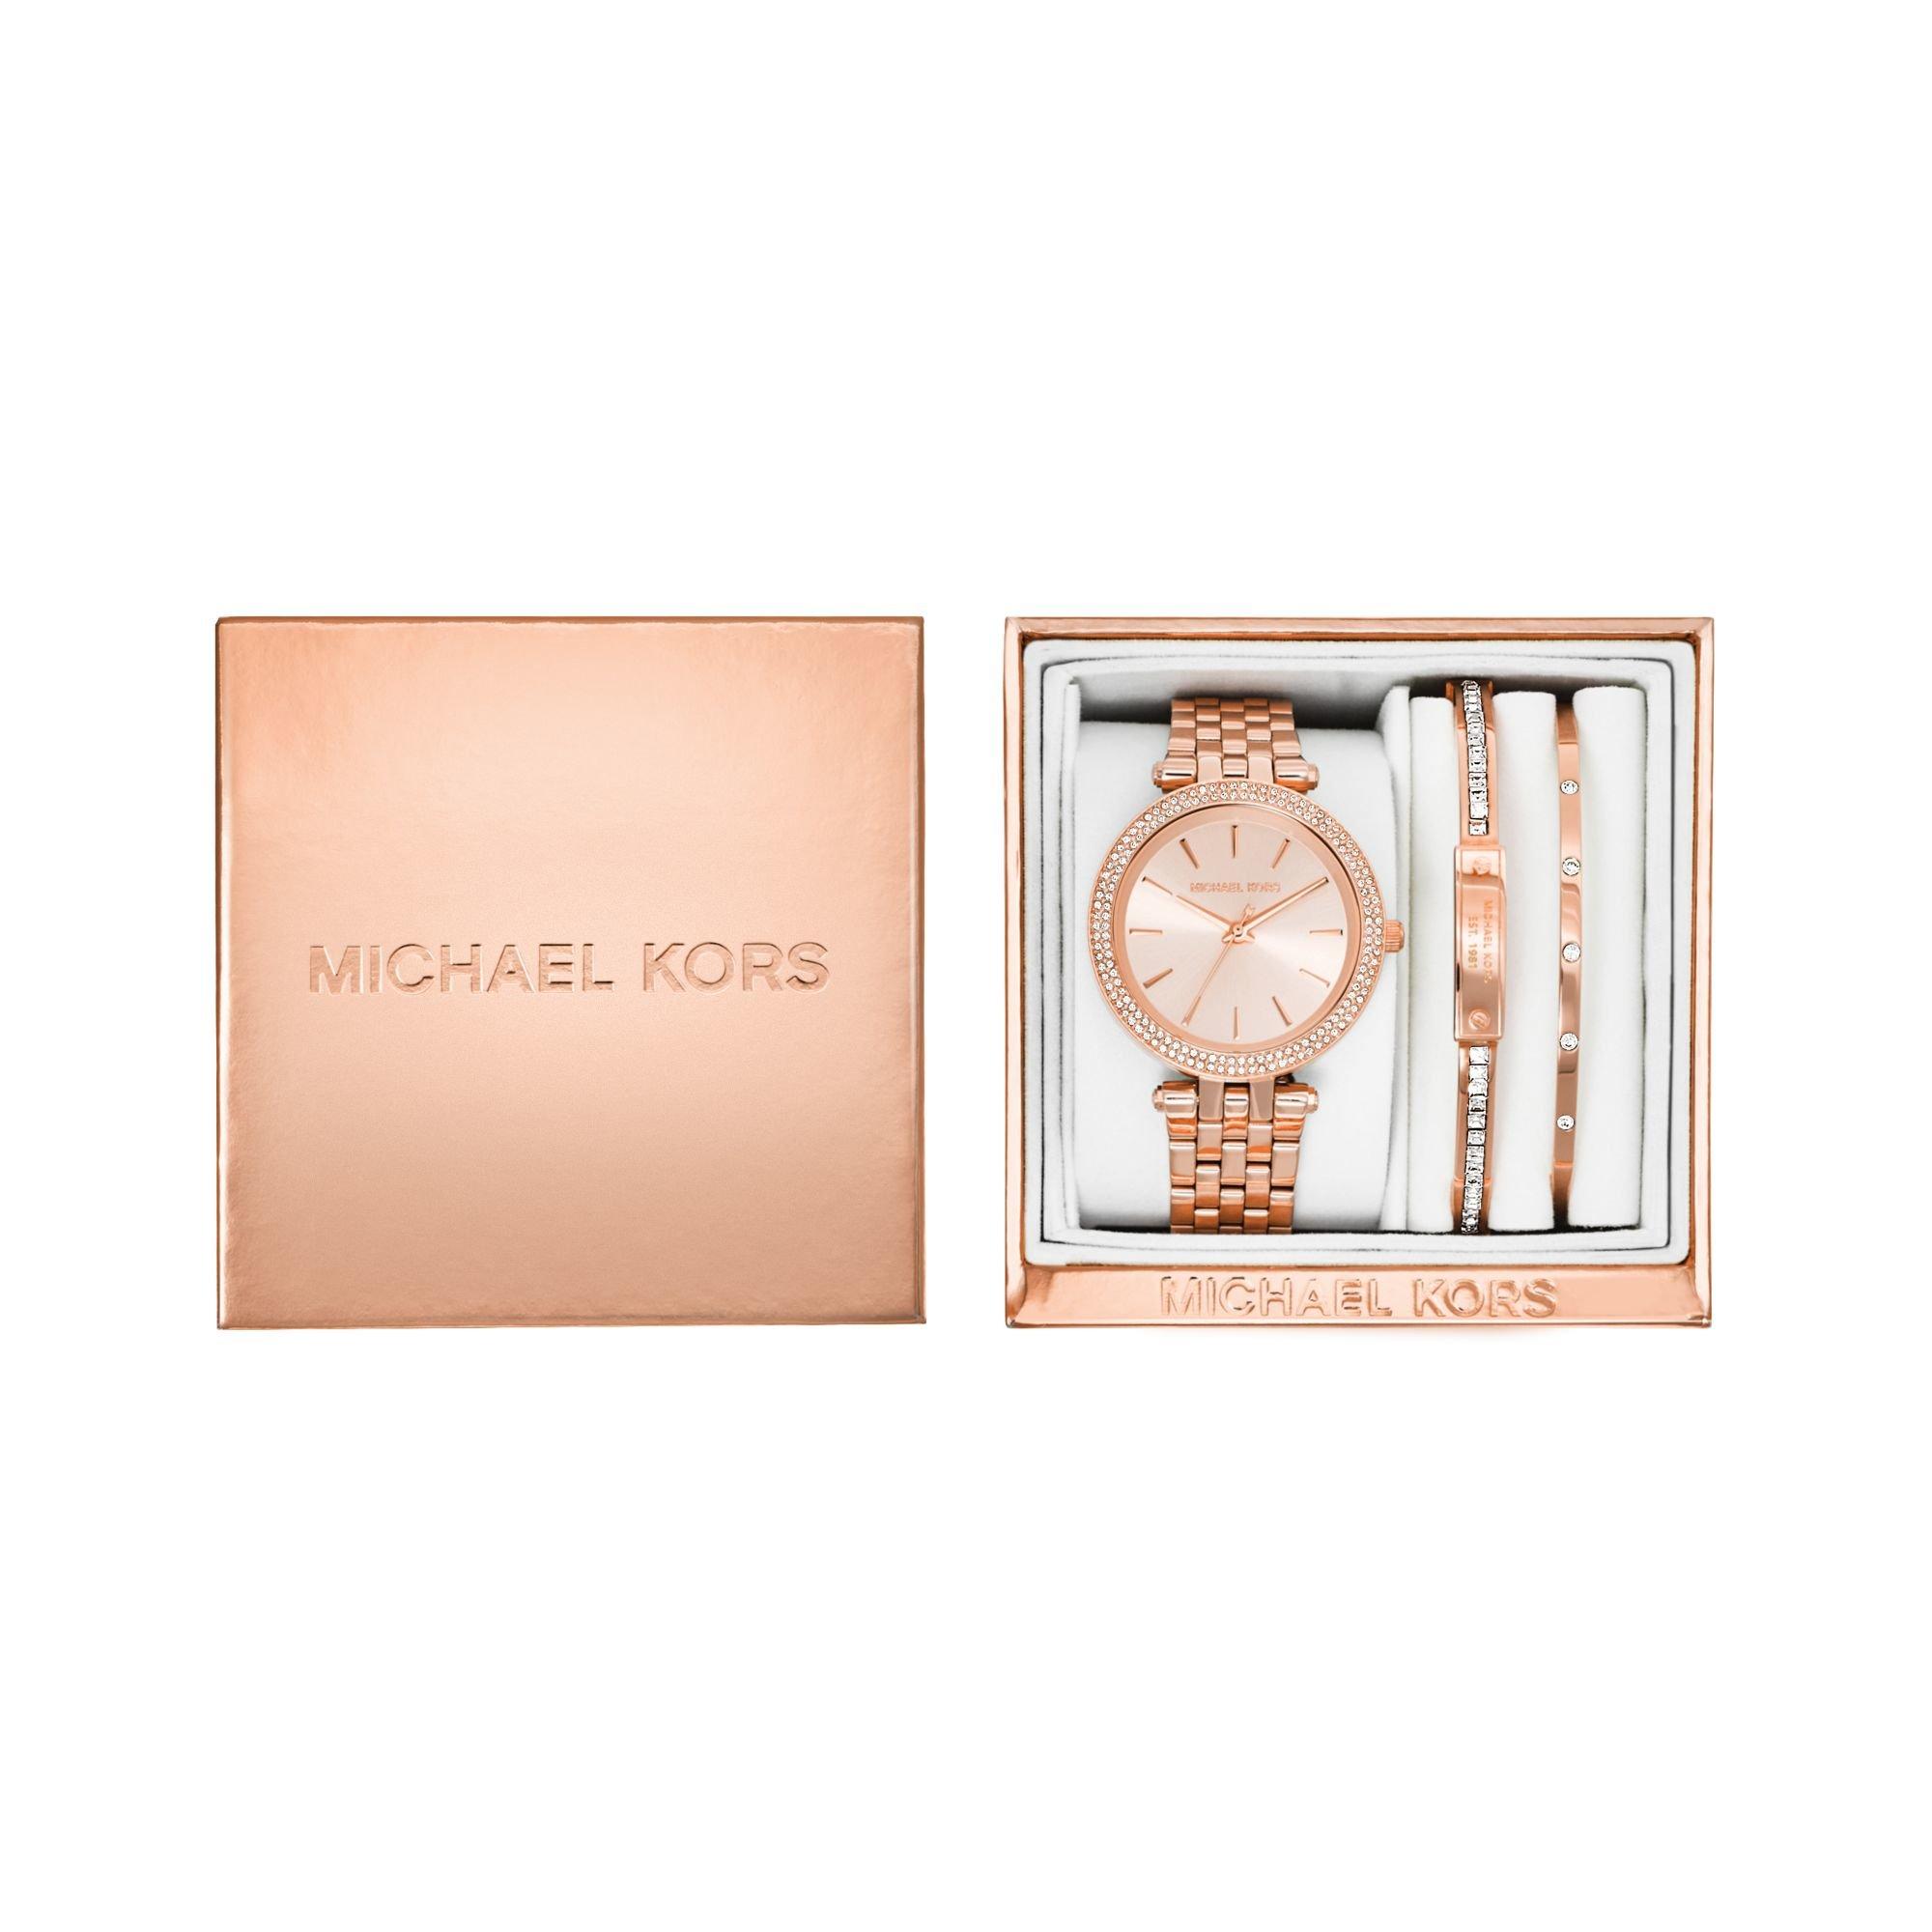 Michael kors Darci Rose Gold-tone Gift Set in Pink | Lyst